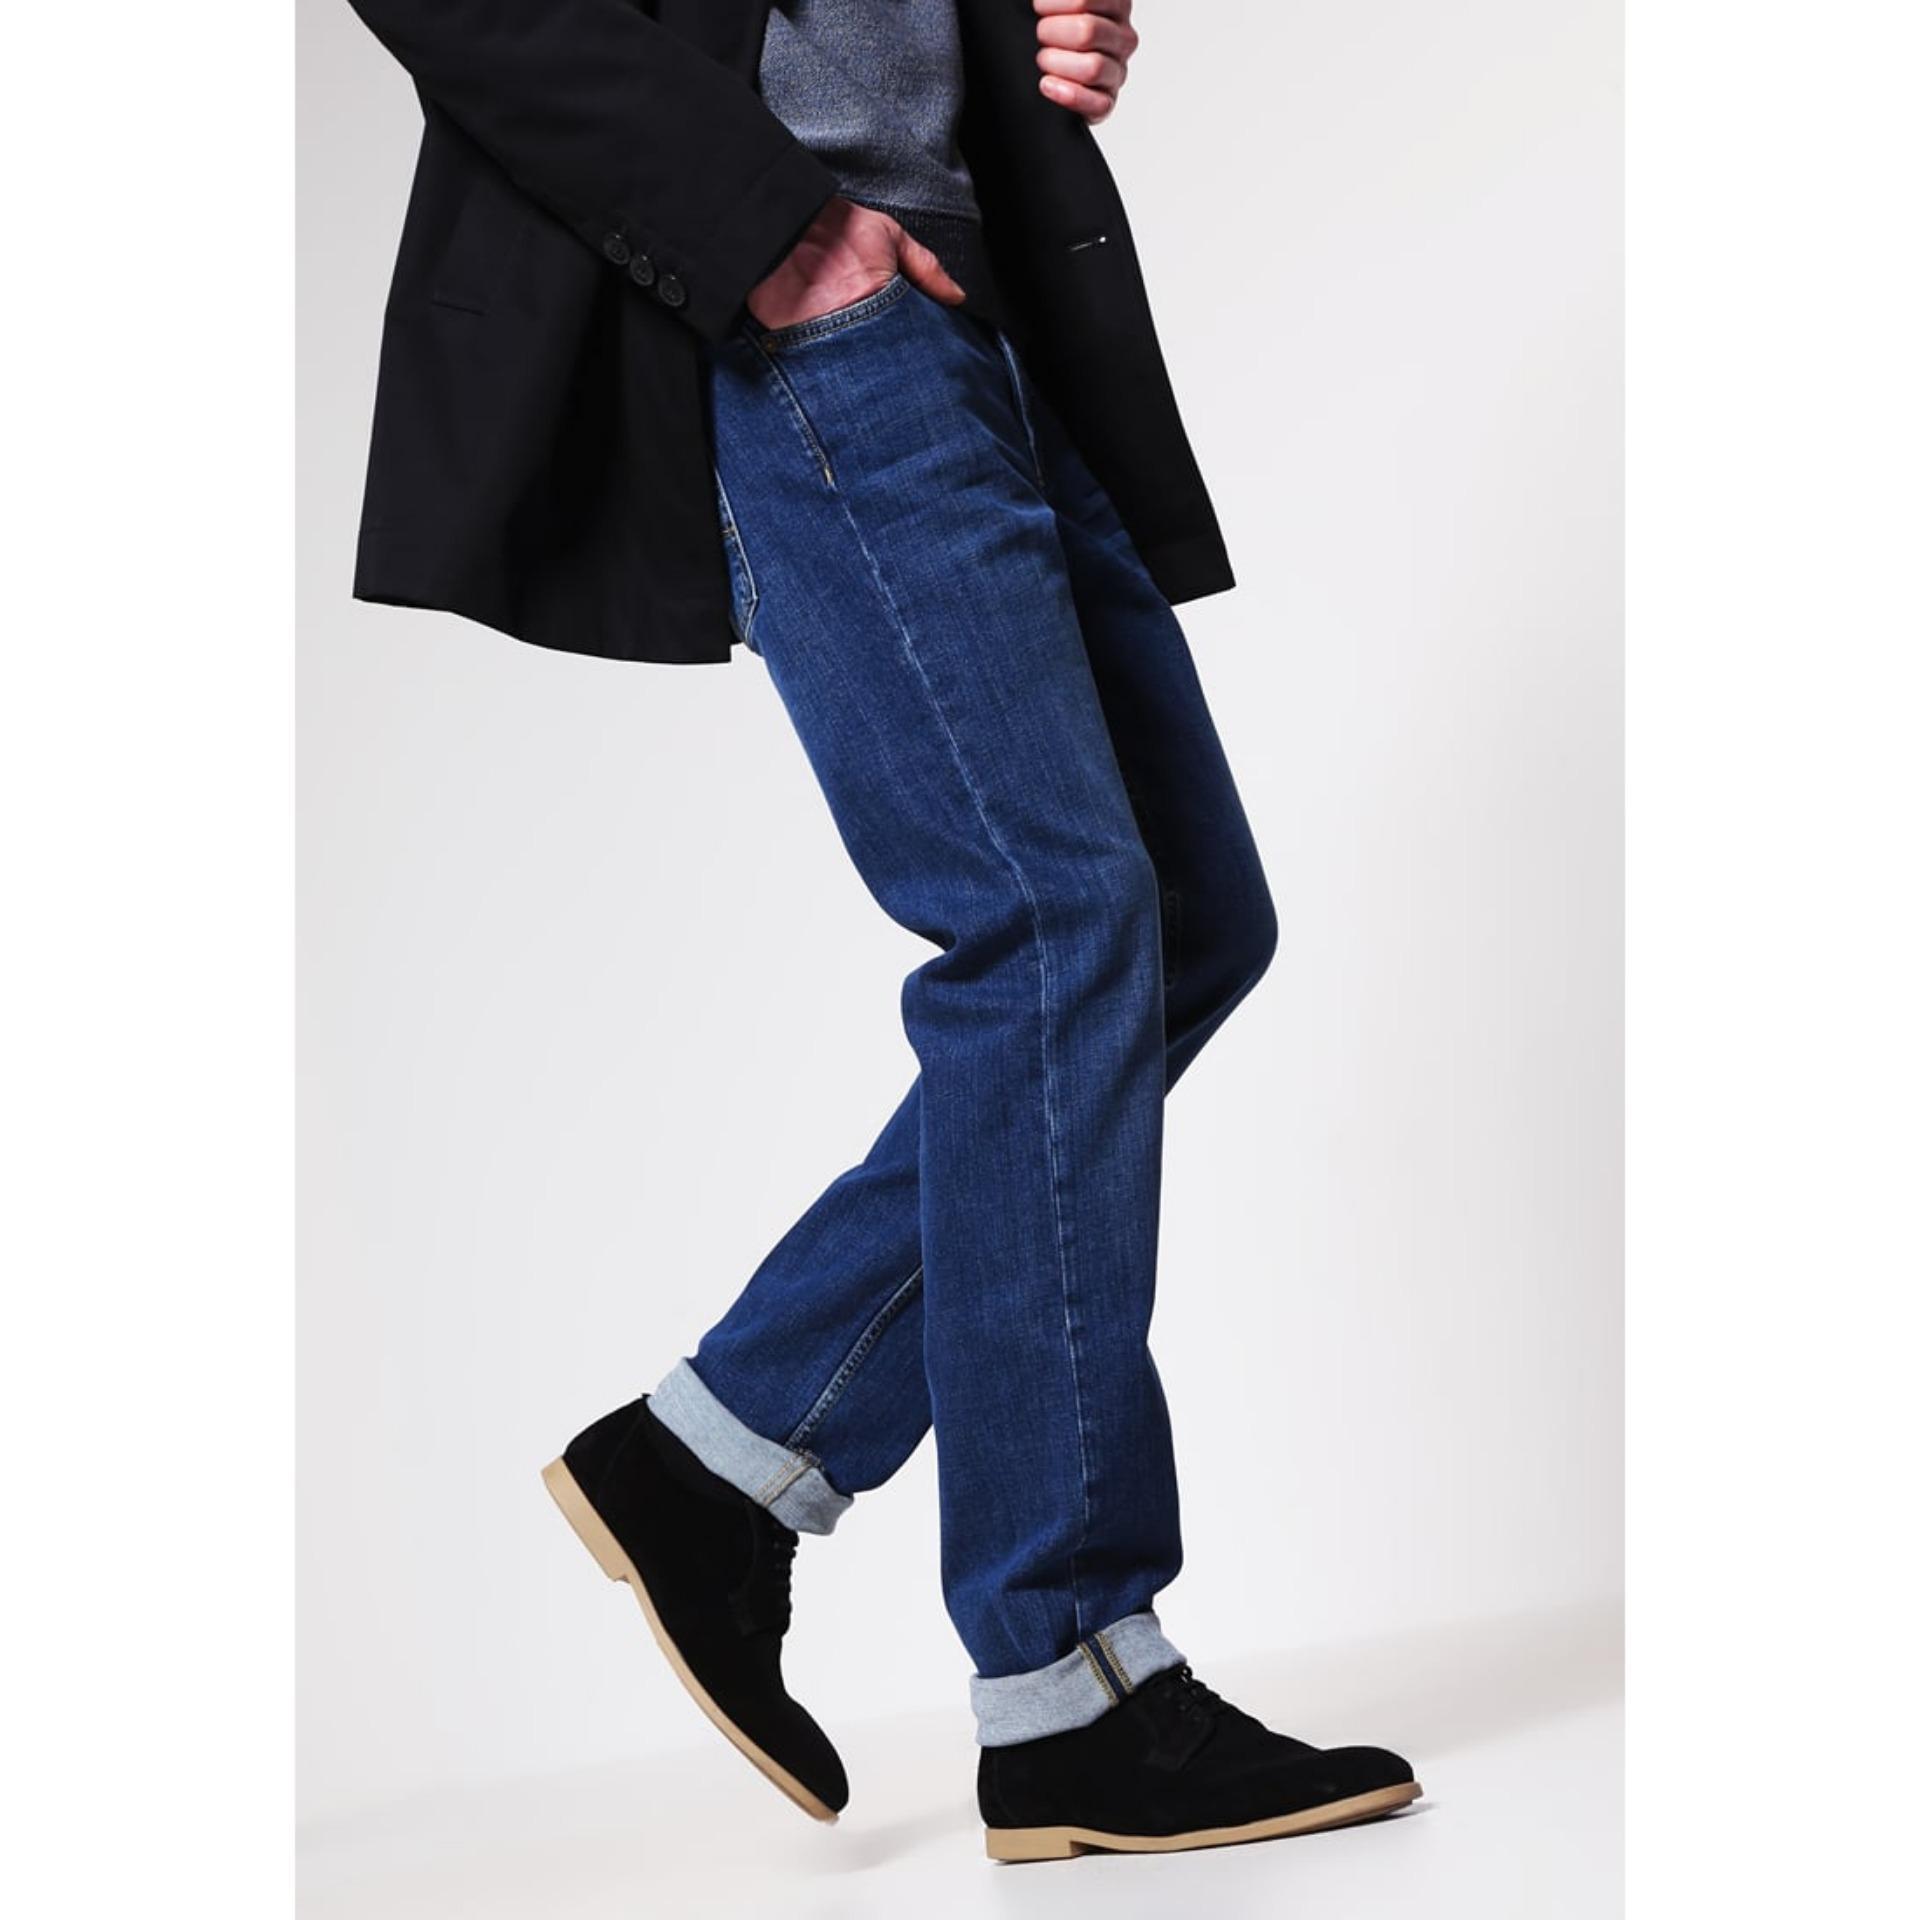 Jual Texan Celana Jeans Panjang Pria Warna Biru Jeans Model Reguler Standard Big Size 33 34 35 36 37 38 Texan Original